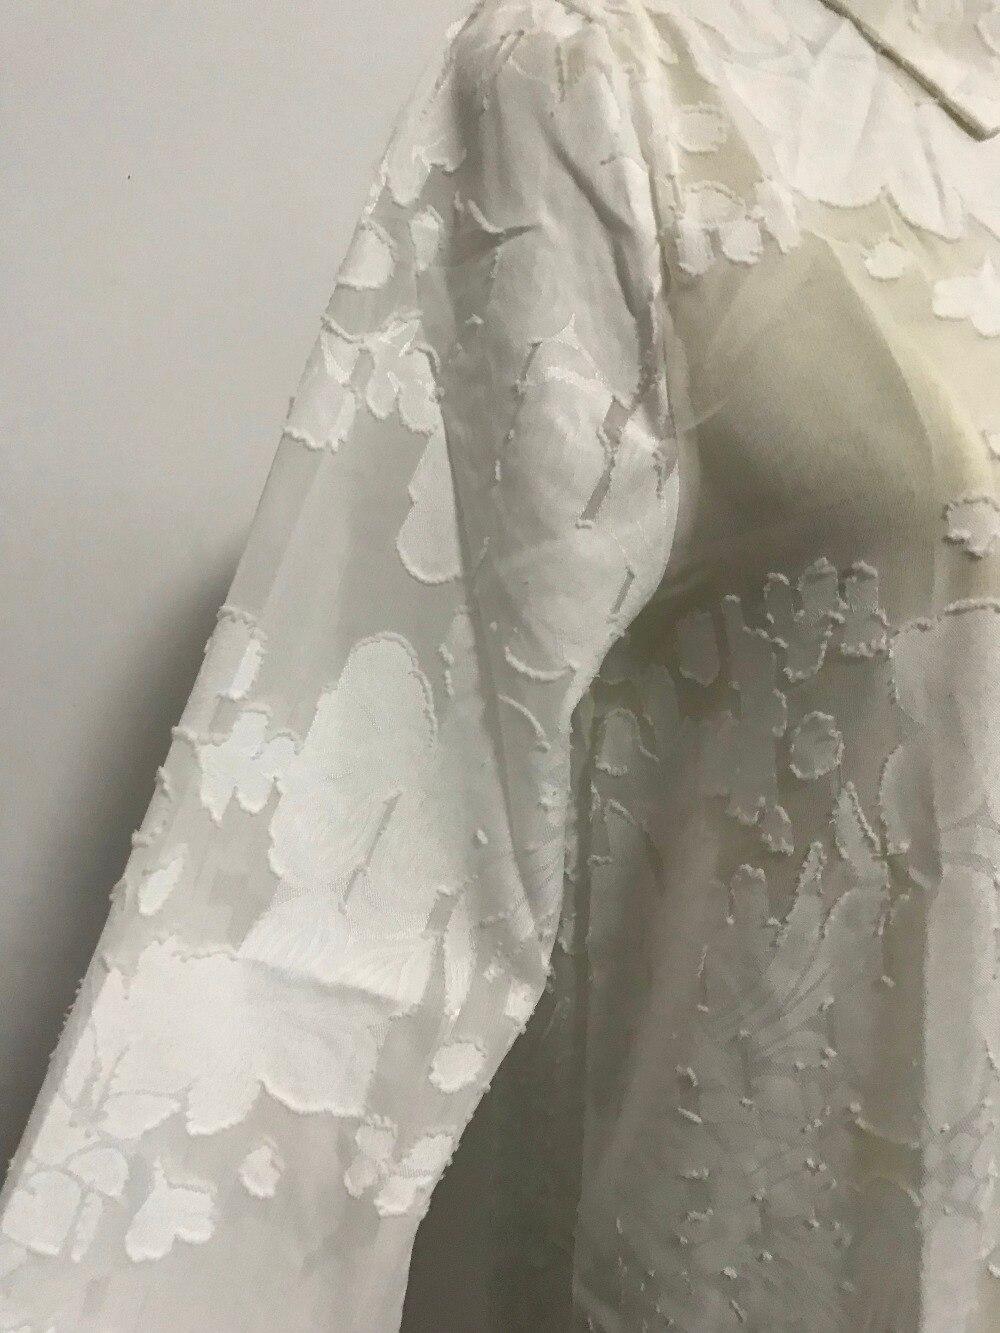 2016 Women Boho Slit Side Lace White Chiffon Maxi Dress New Spring Putih Renda A30554 Img 3337 3338 3339 3340 3341 3342 3343